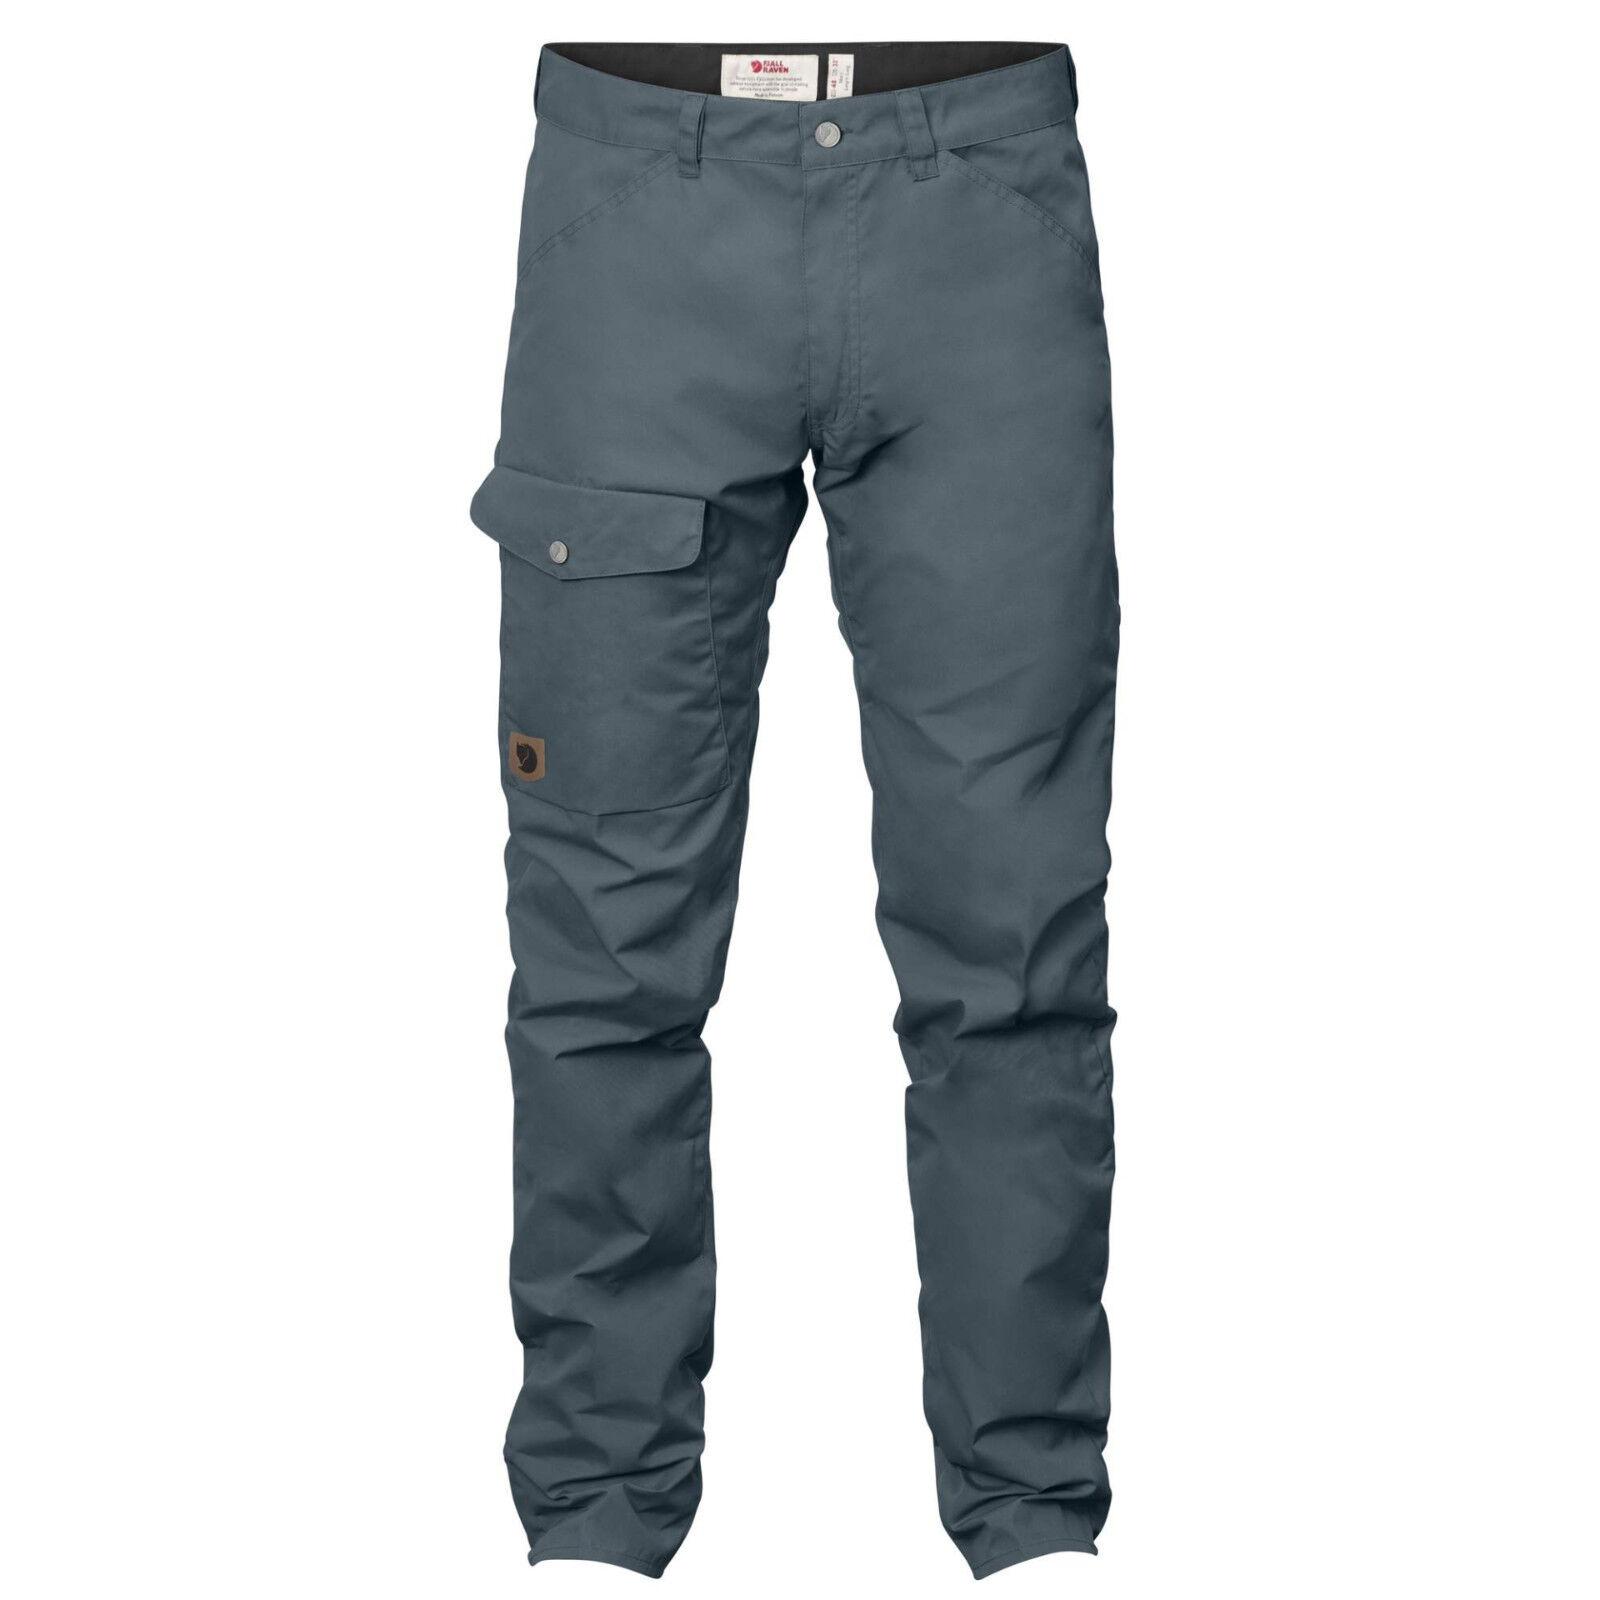 Fjällräven verdeland jeans Men 81871 Dusk g-1000 pantalones señores pantalones outdoorhose